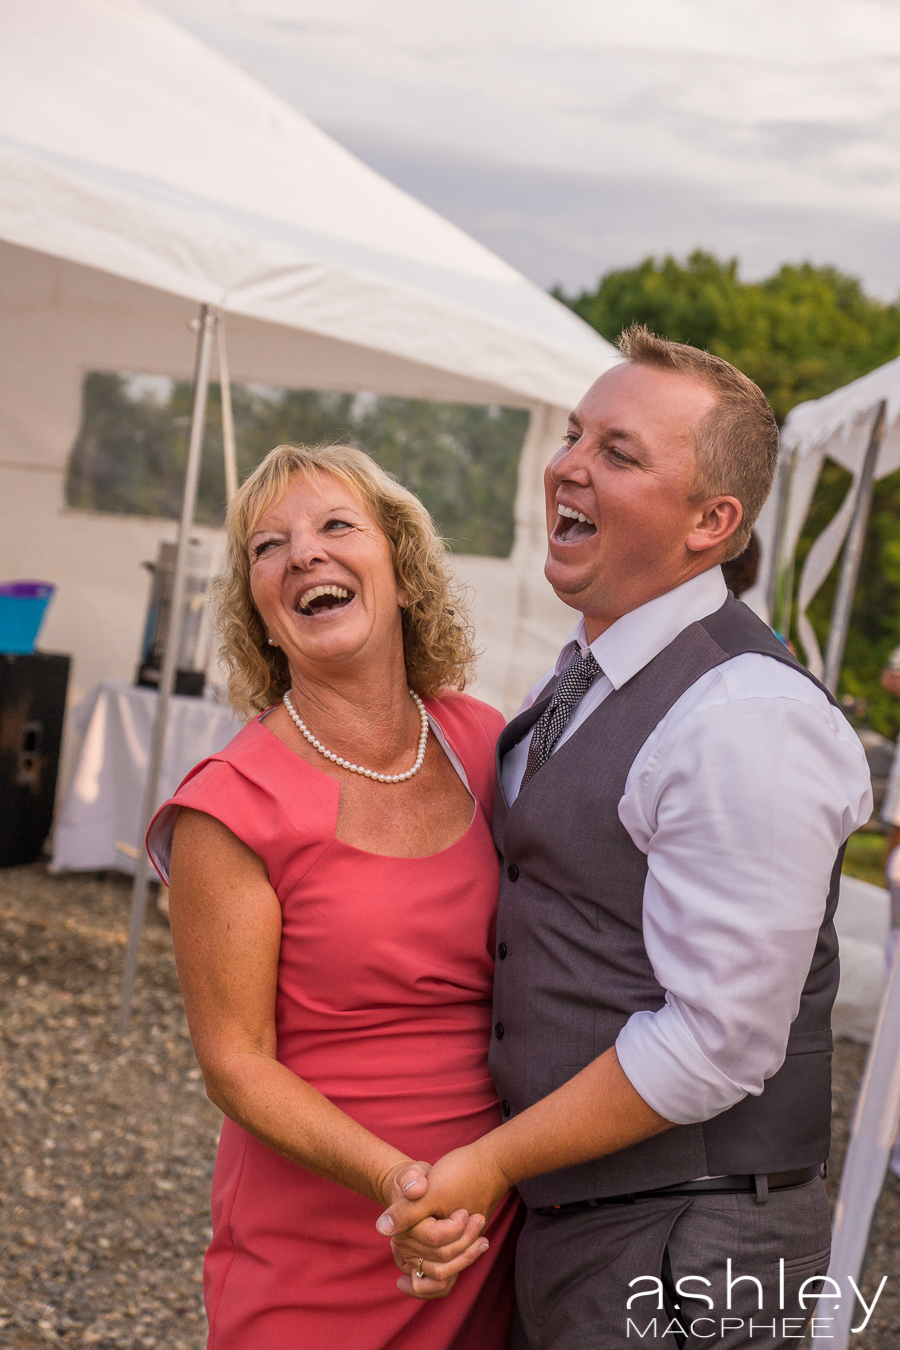 Ashley MacPhee Photography New Brunswick Wedding Photographer (59 of 65).jpg